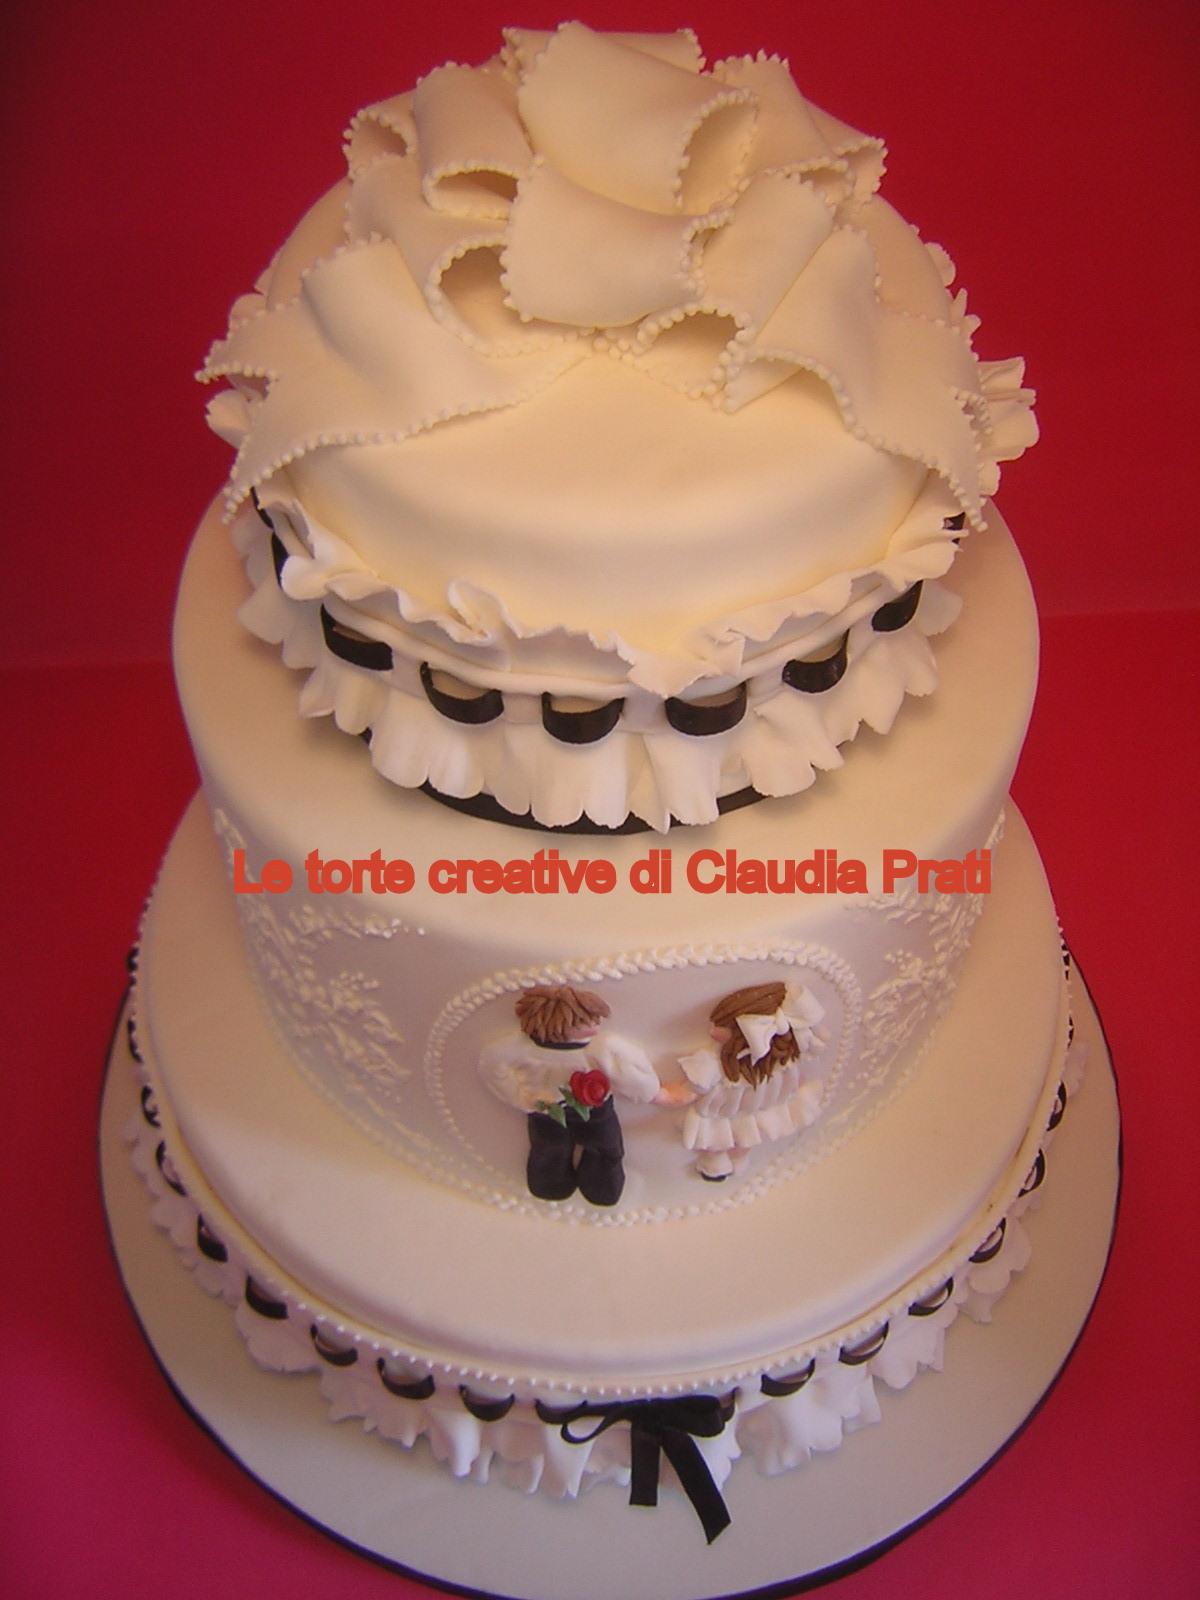 Franchising Cake Design Italia : Le torte creative di Claudia Prati: Wedding cake black and ...